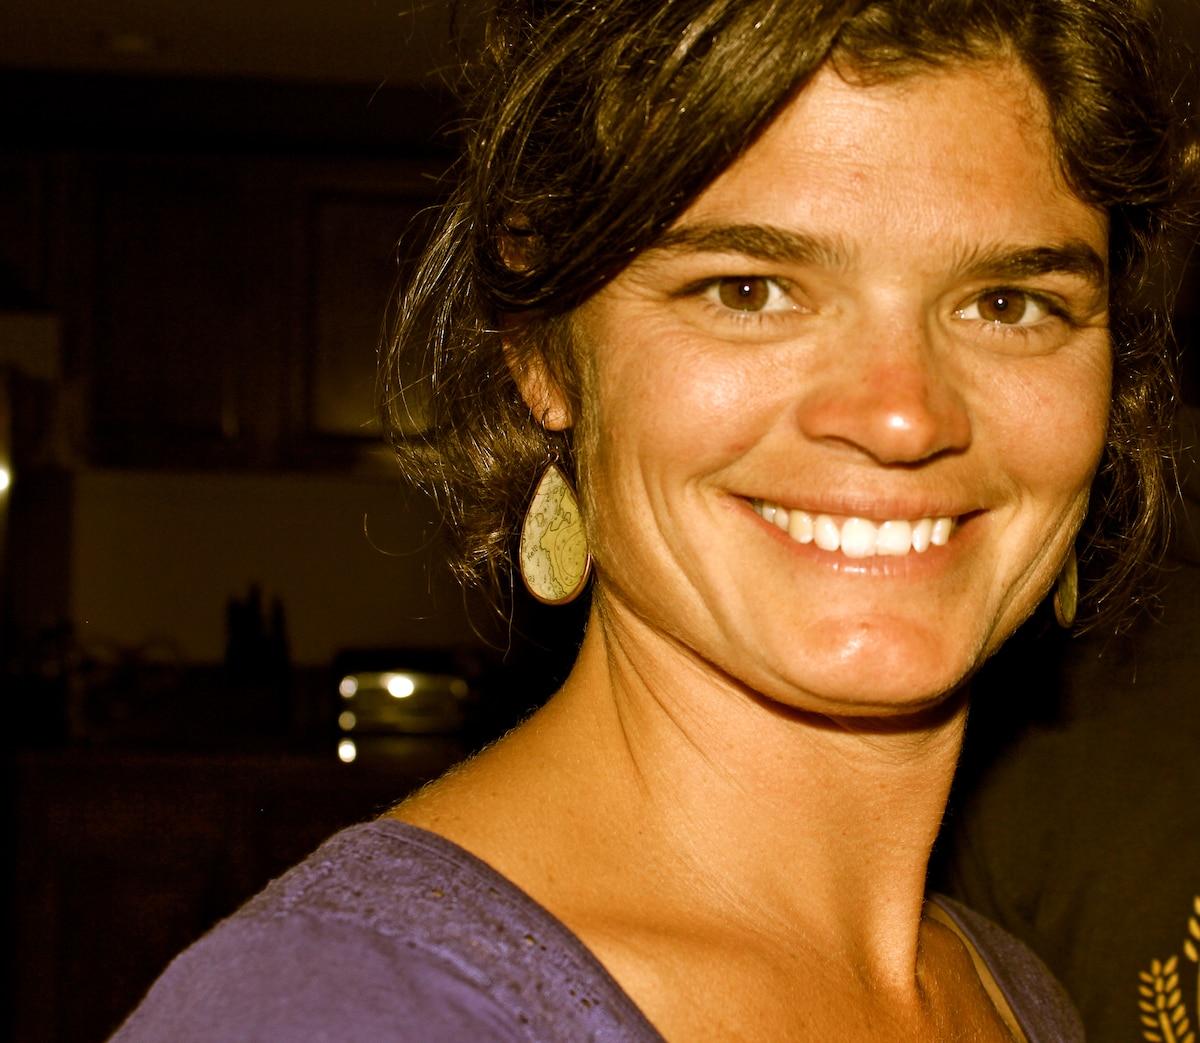 Brooke From Okanogan, WA